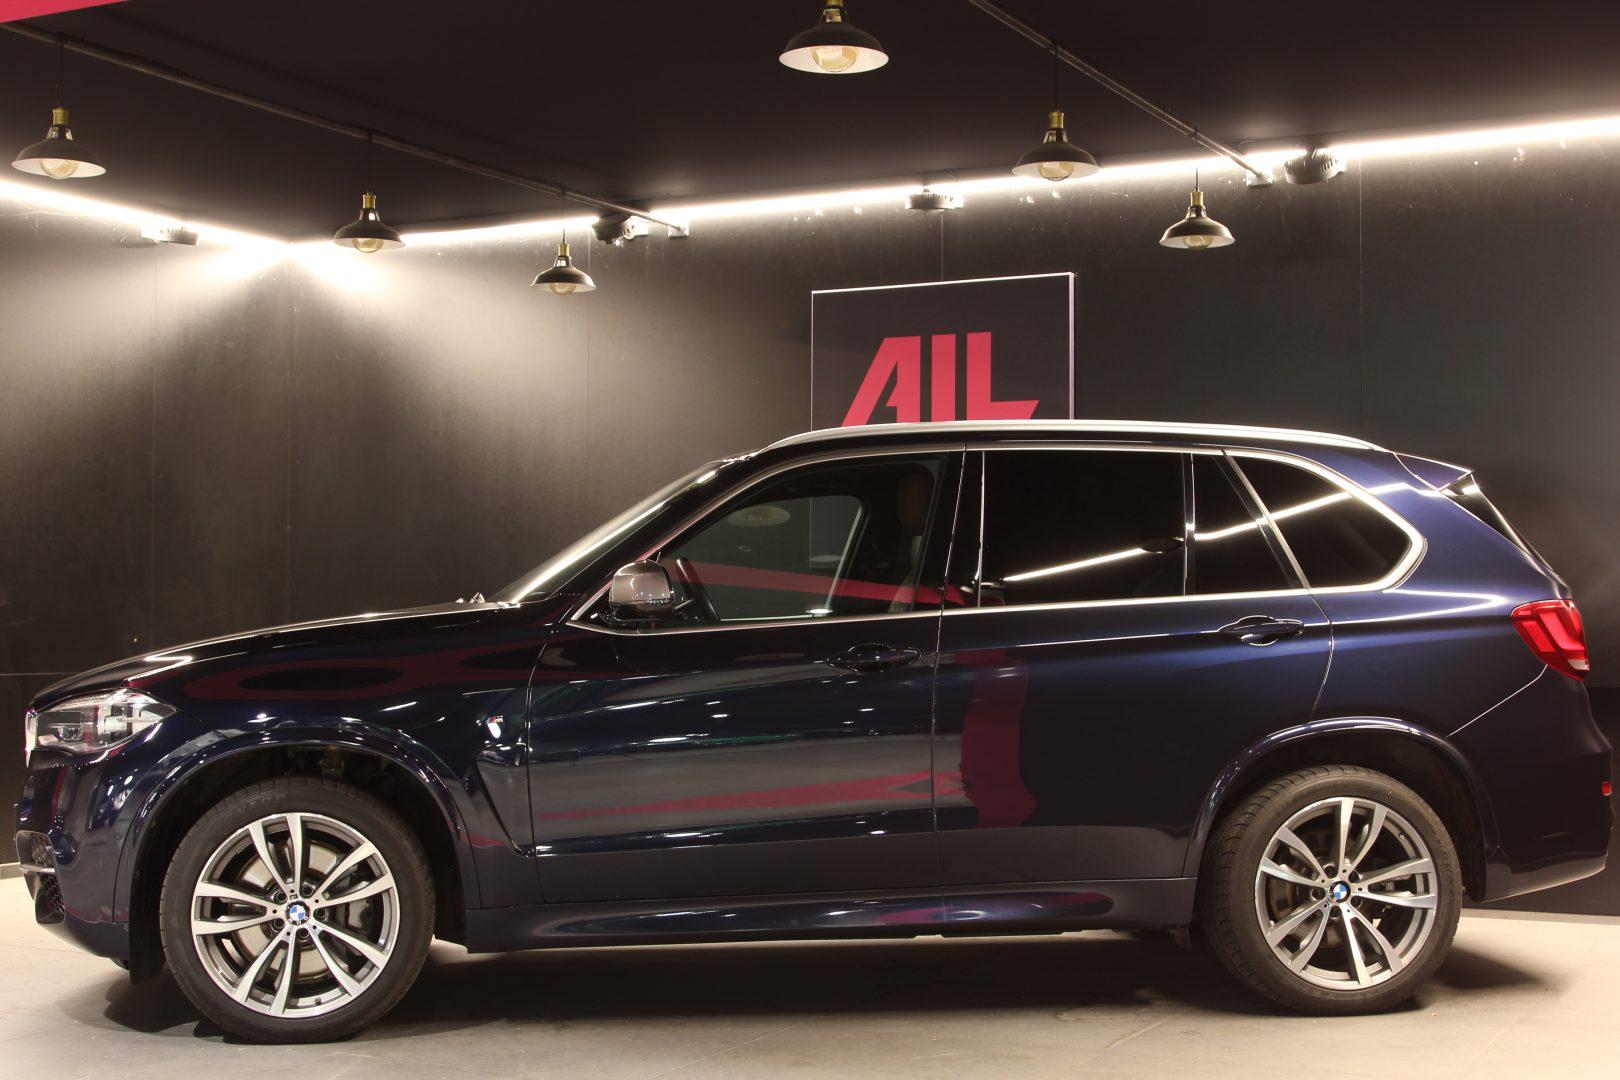 AIL BMW X5 M50d Bang & Olufsen Panorama RSE 7